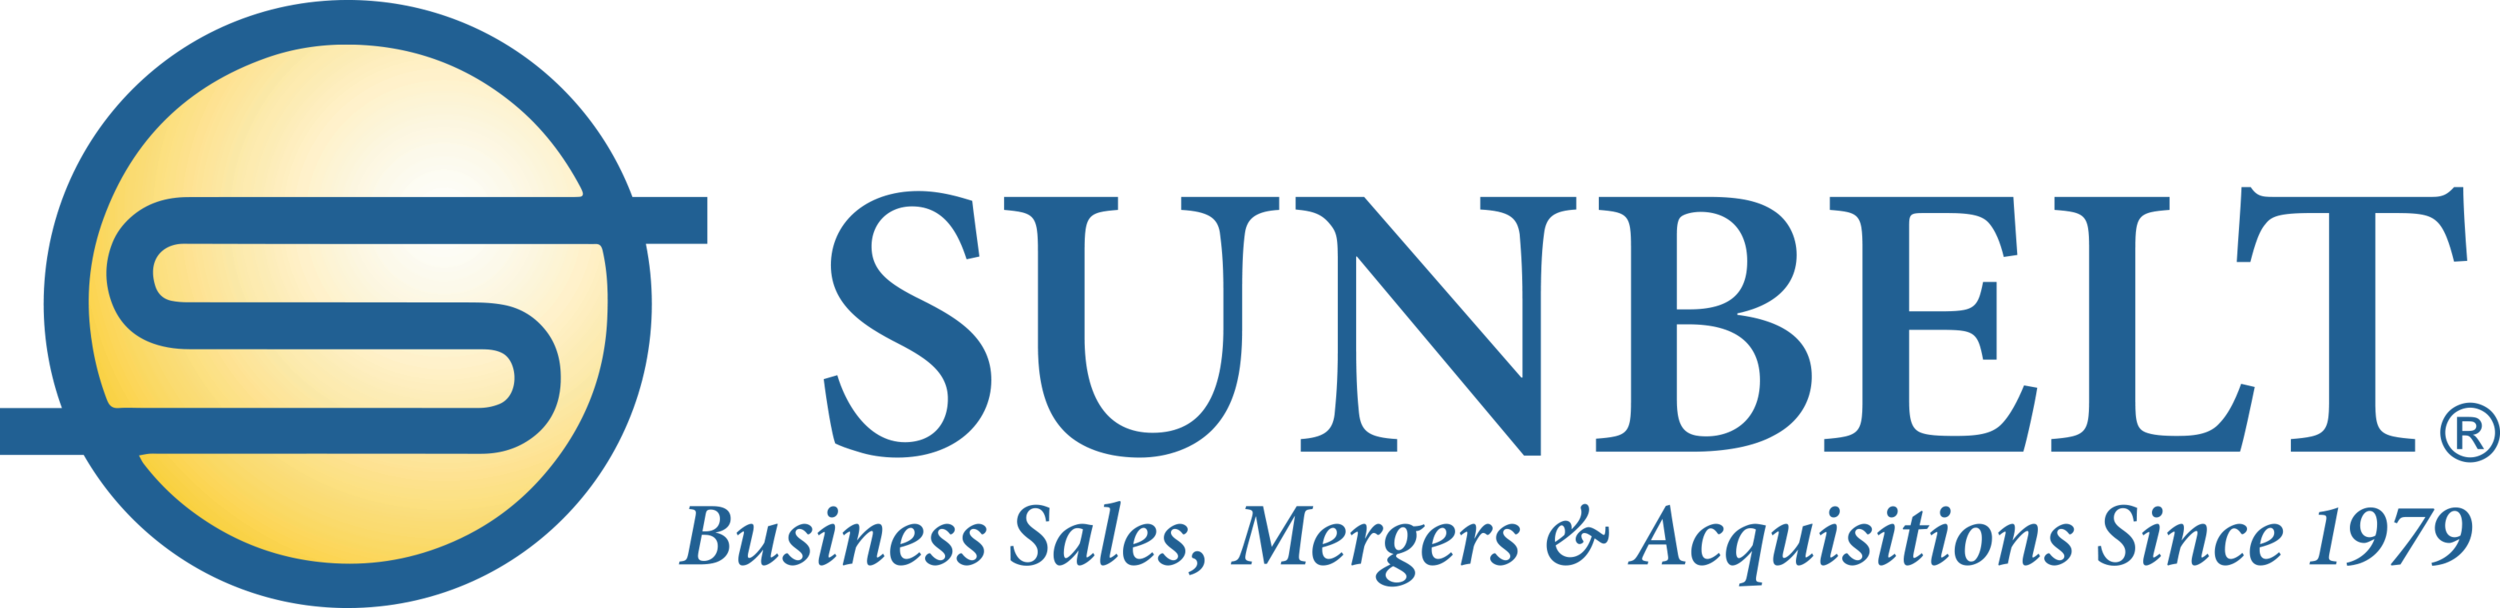 Sunbelt_PMS_Logos_Long.png